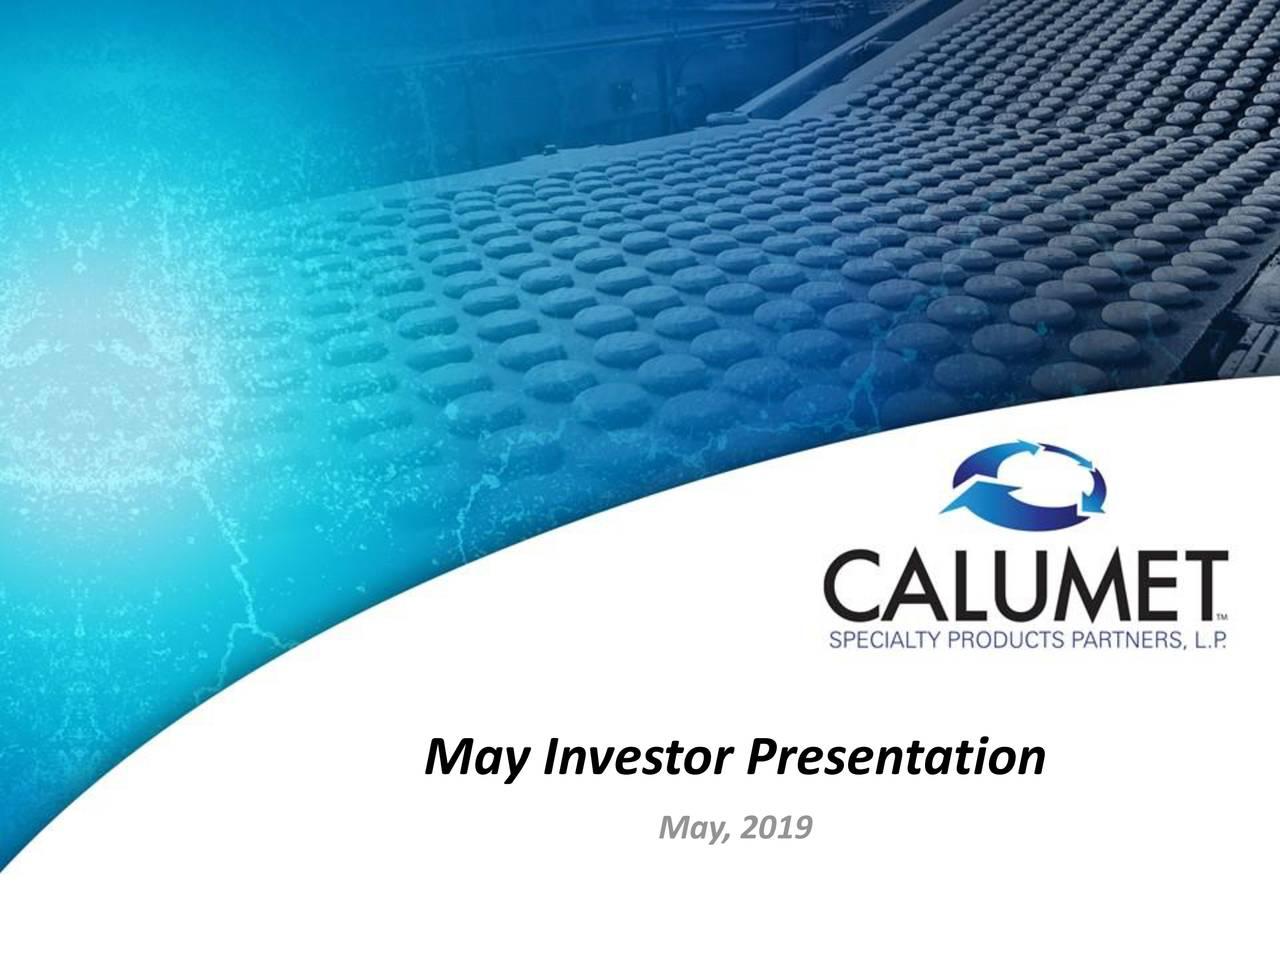 May Investor Presentation